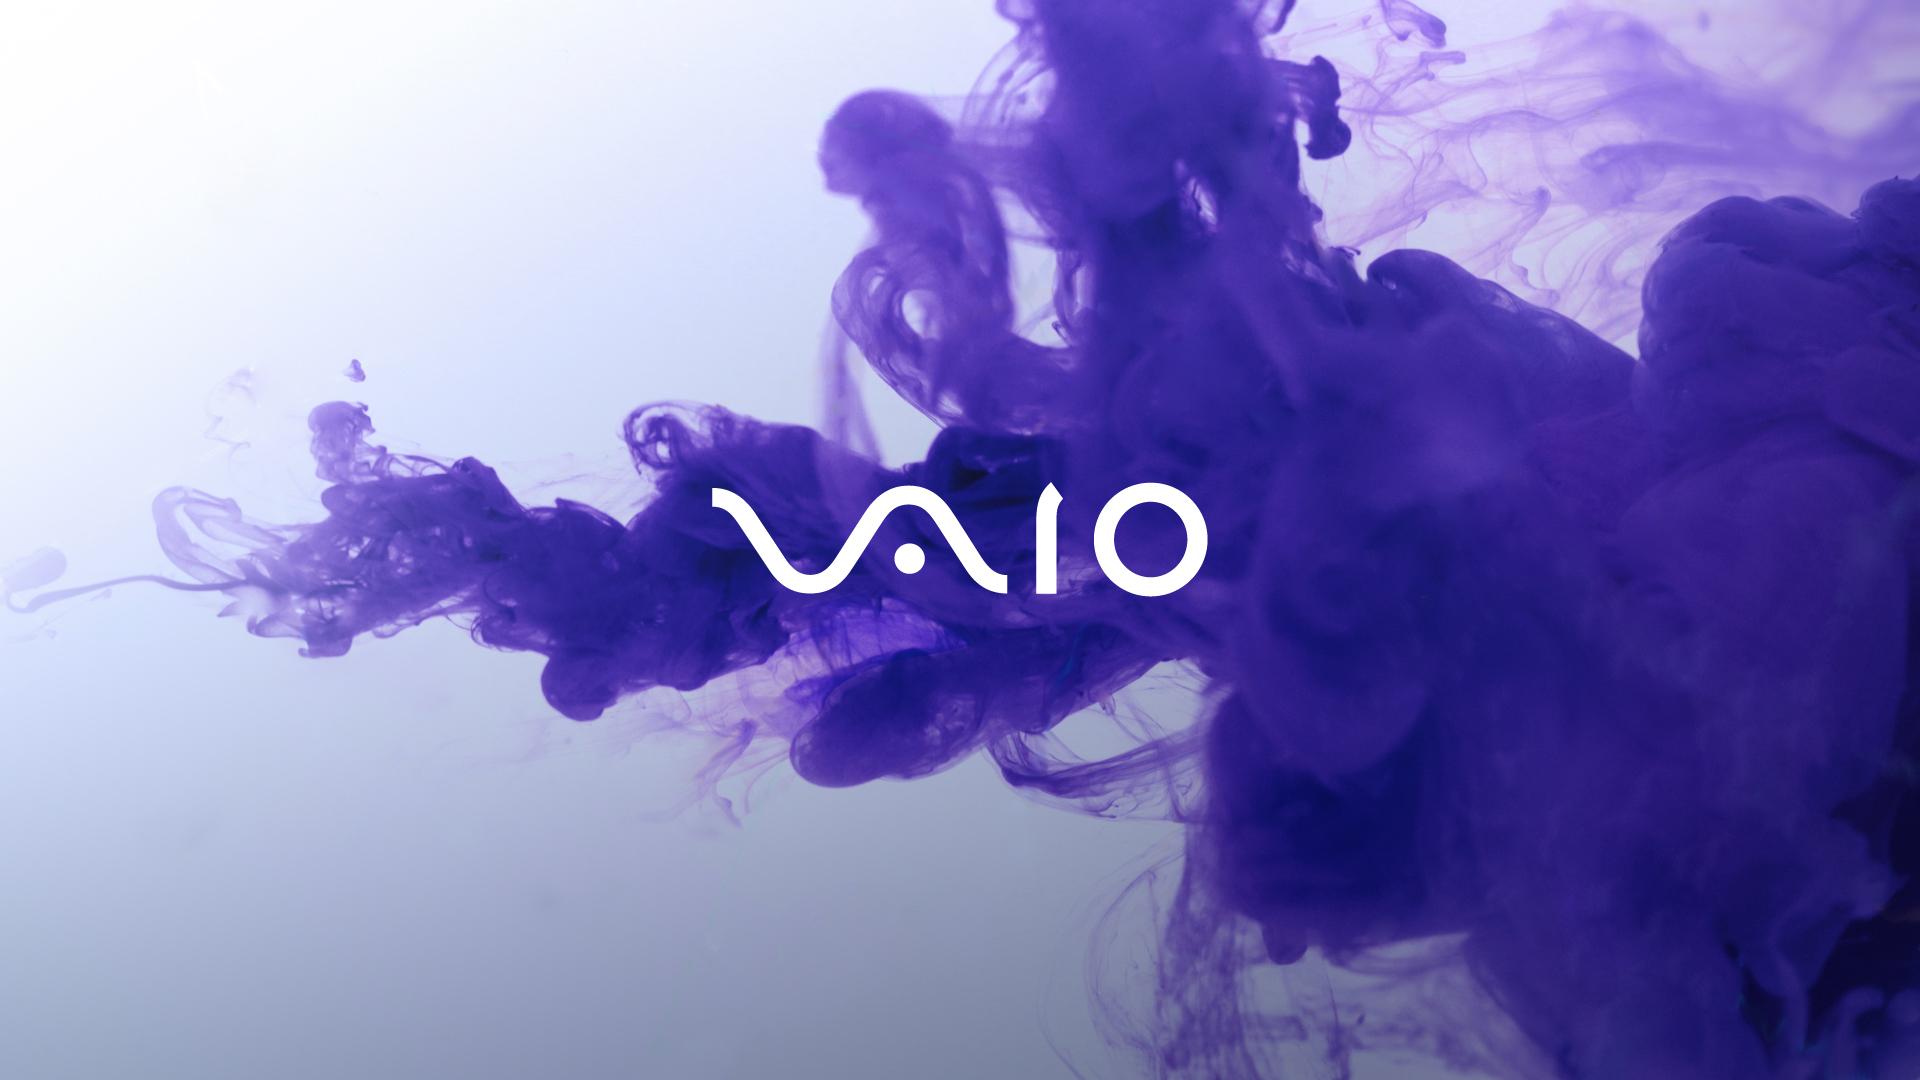 50+] Sony Vaio Wallpaper 1080p on WallpaperSafari